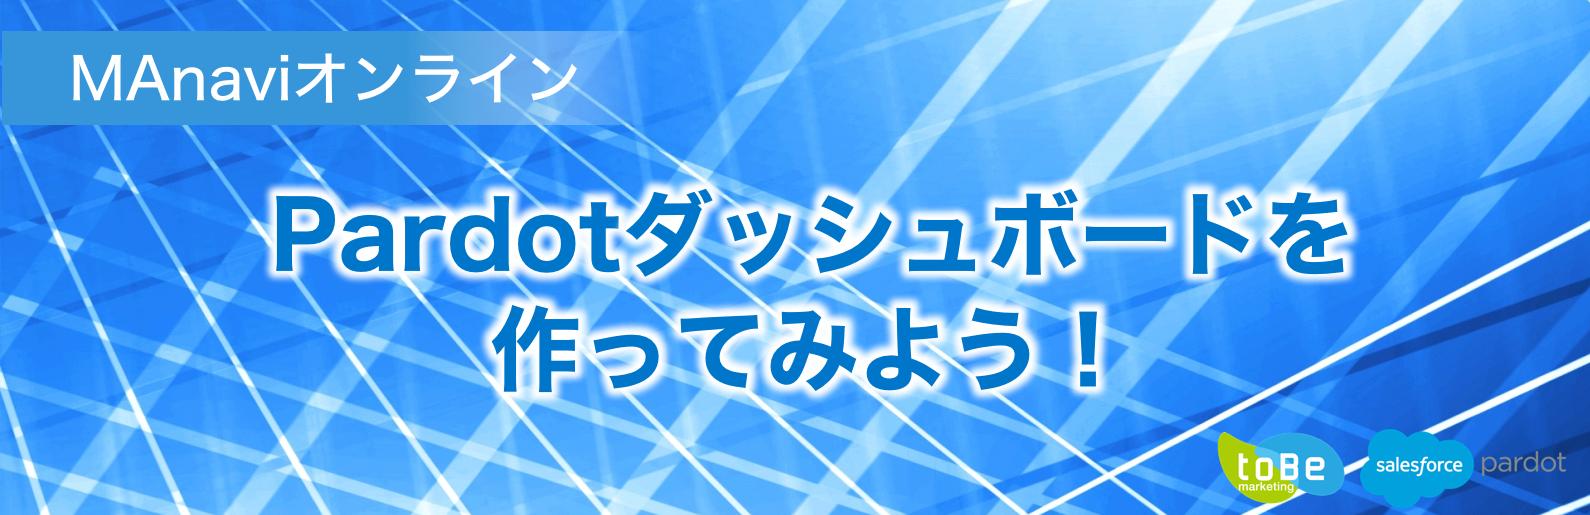 【MAnaviオンライン】Pardotダッシュボードを作ってみよう!